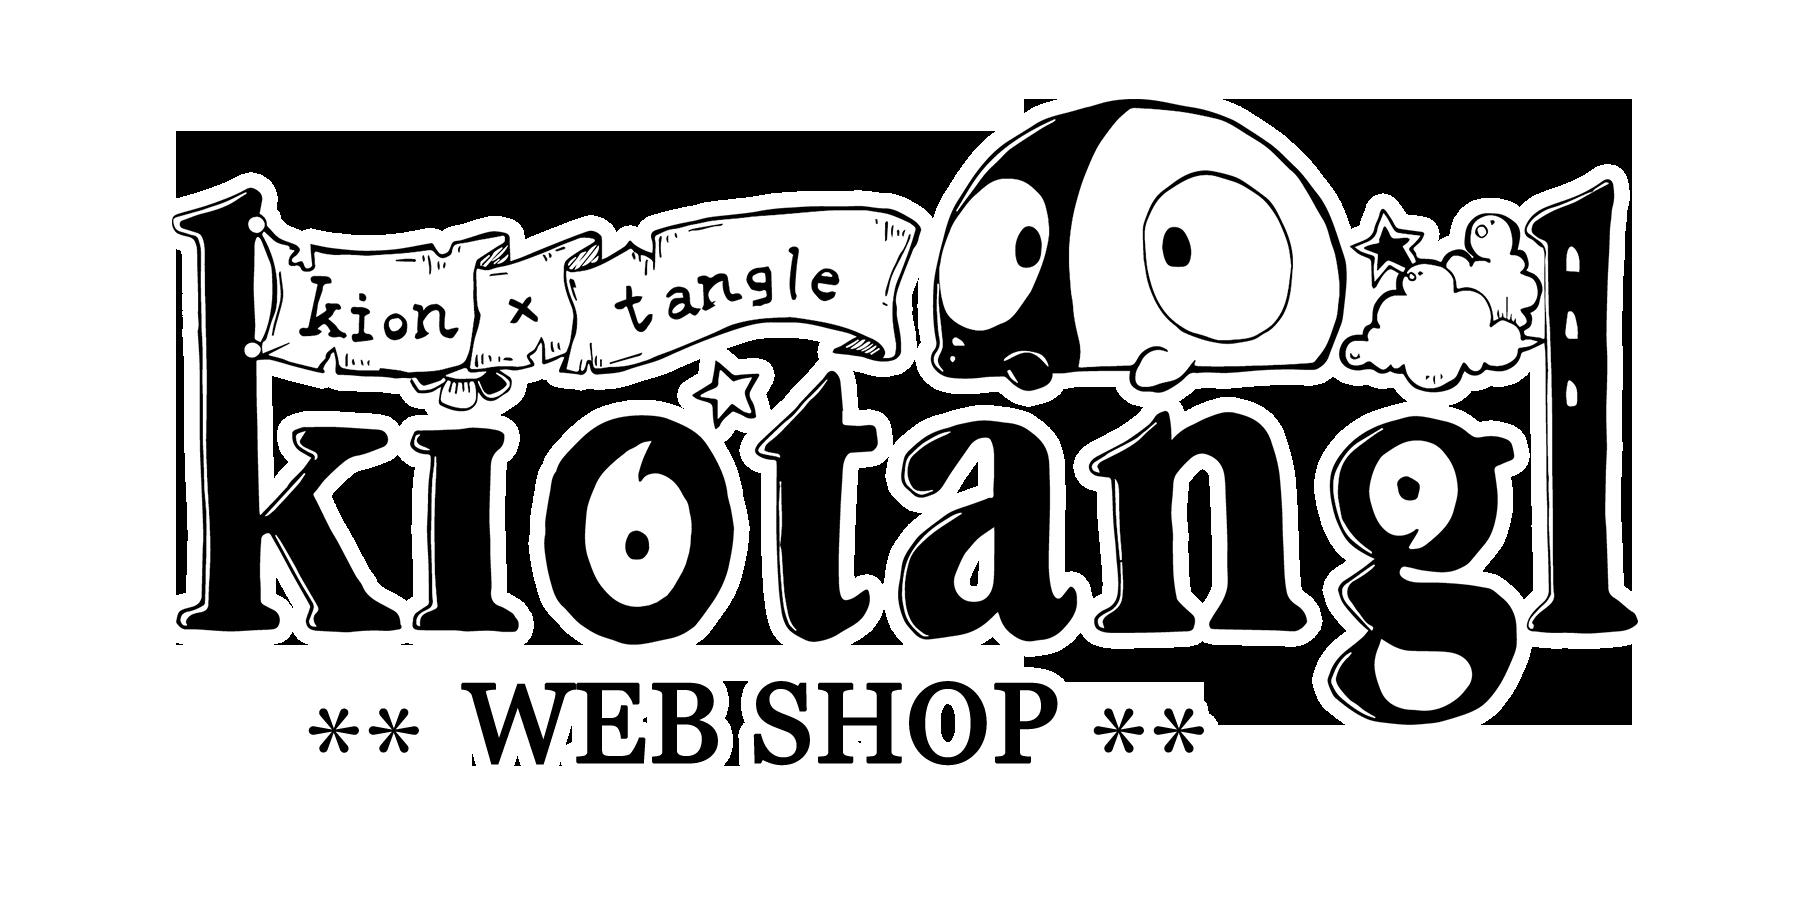 kiotangl web shop